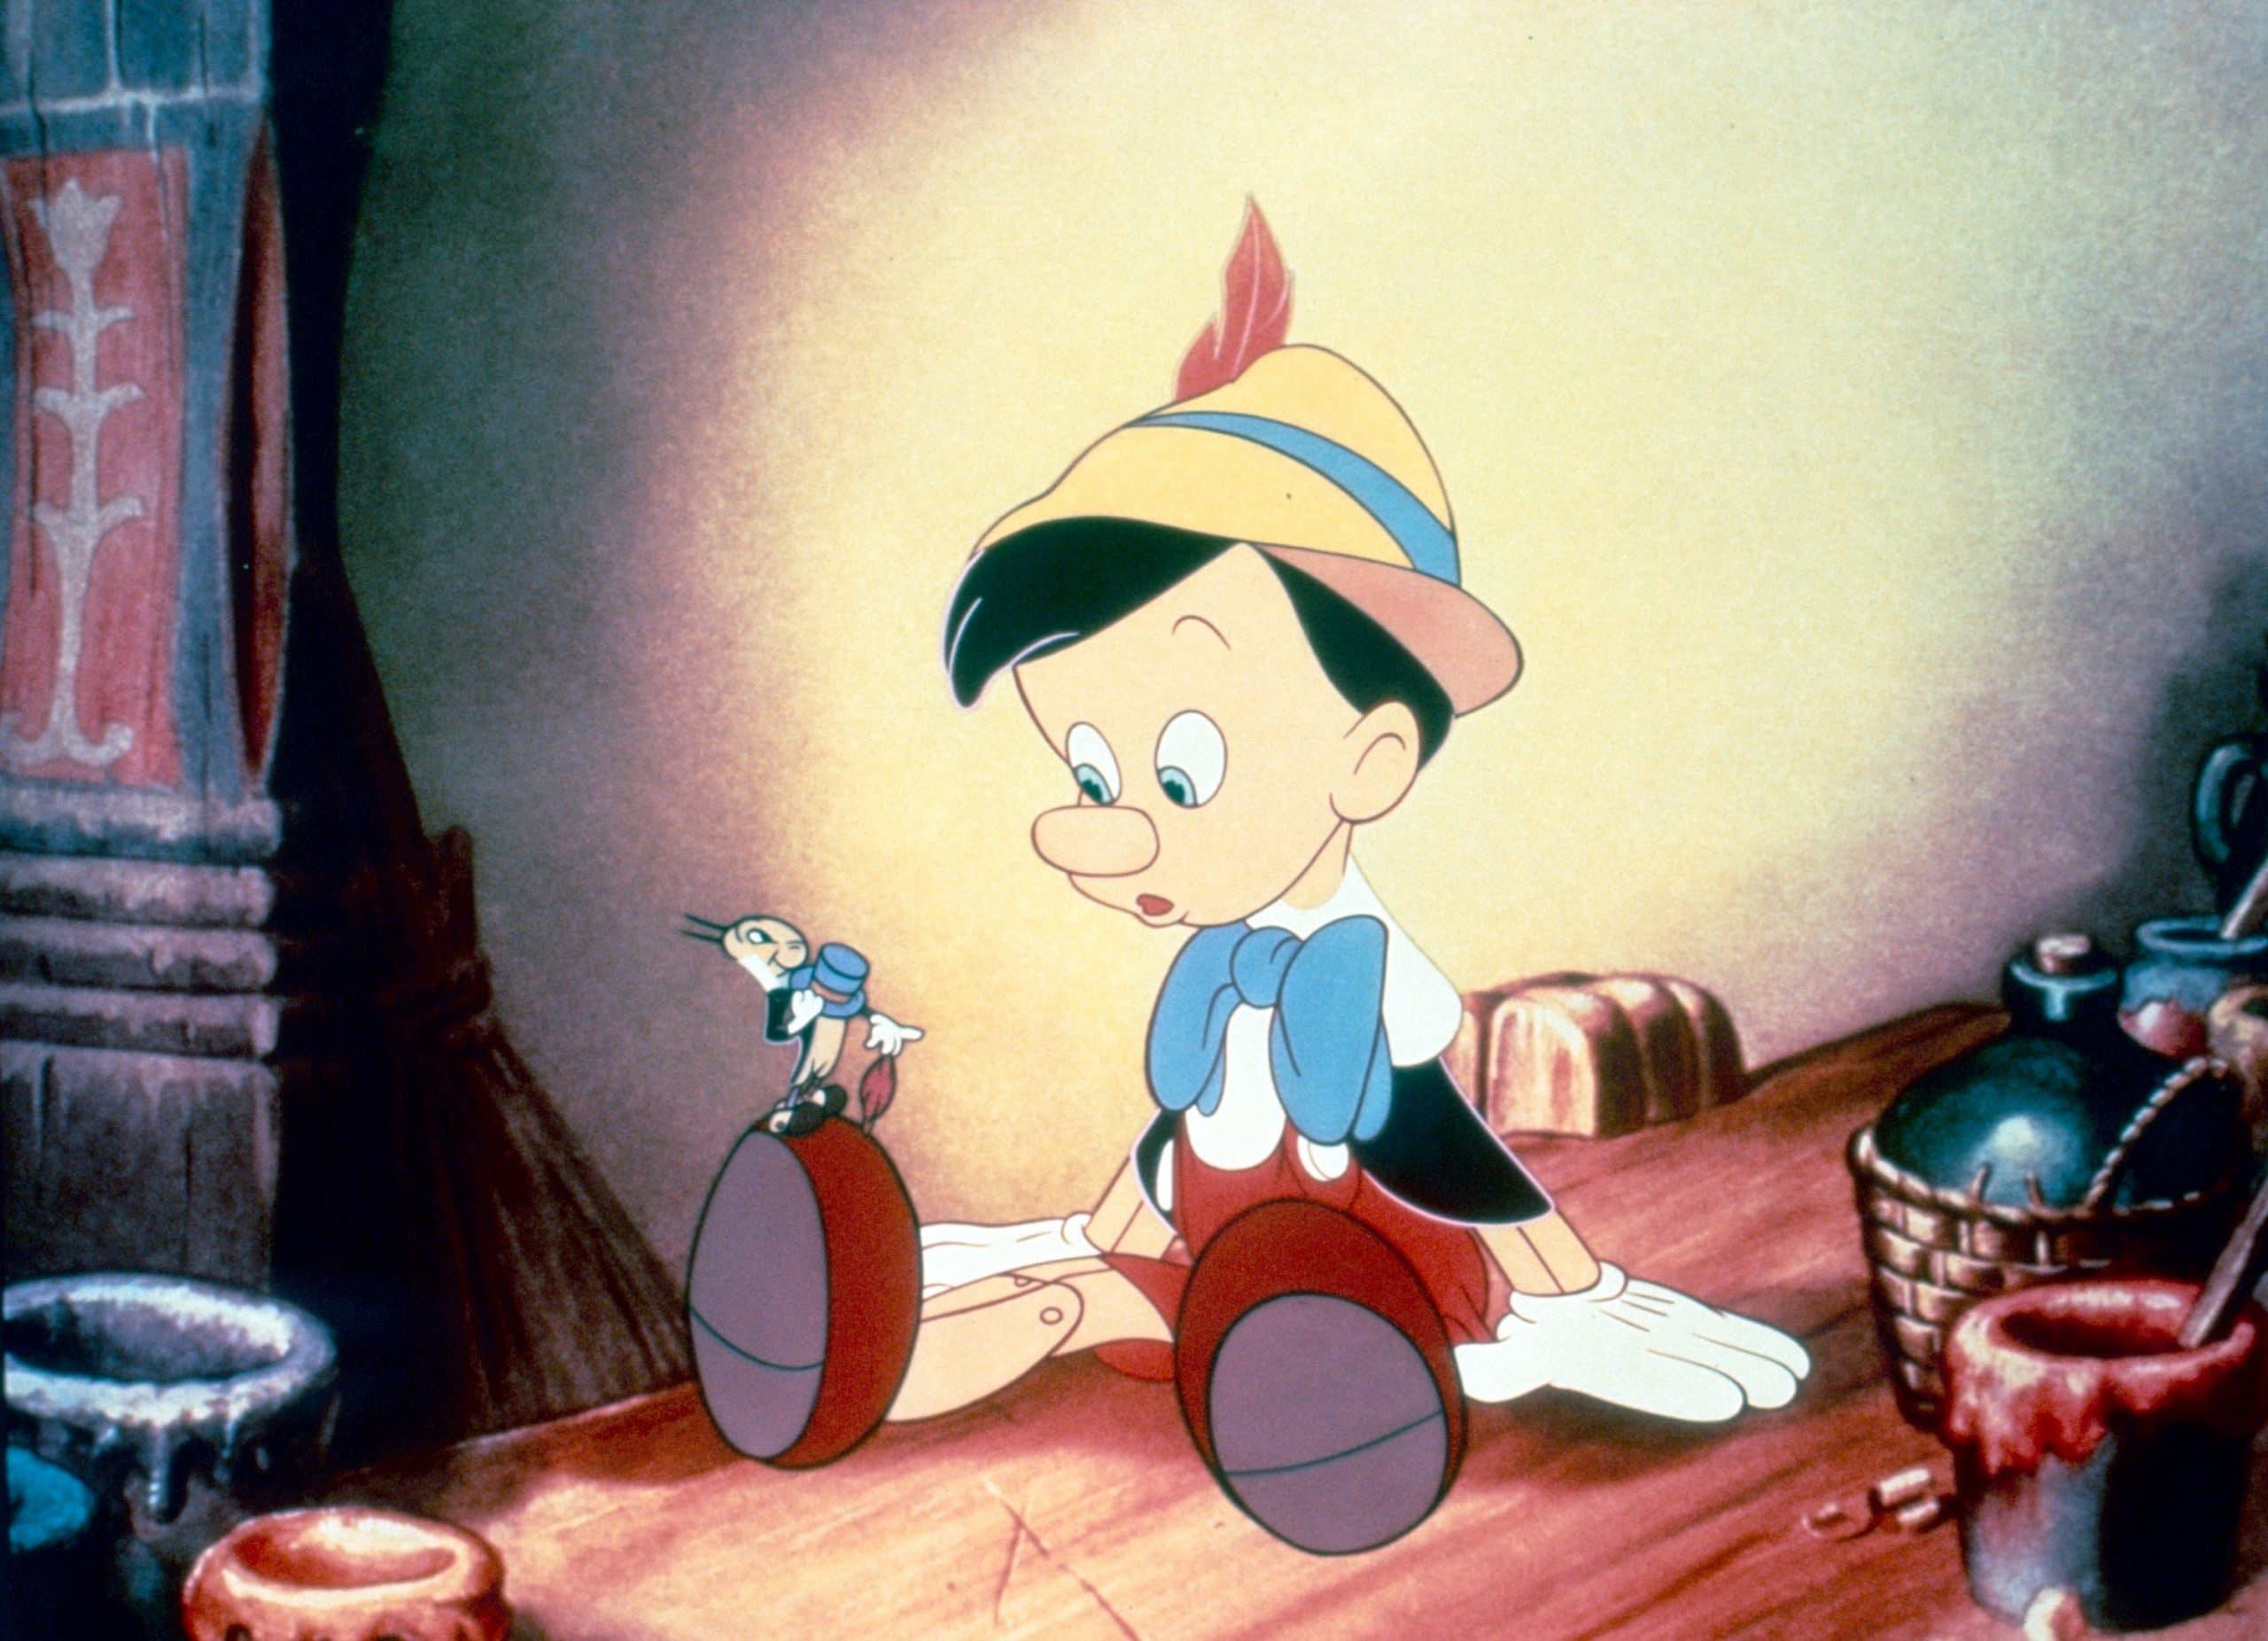 PINOCCHIO, from left: Jiminy Cricket,Pinocchio, 1940